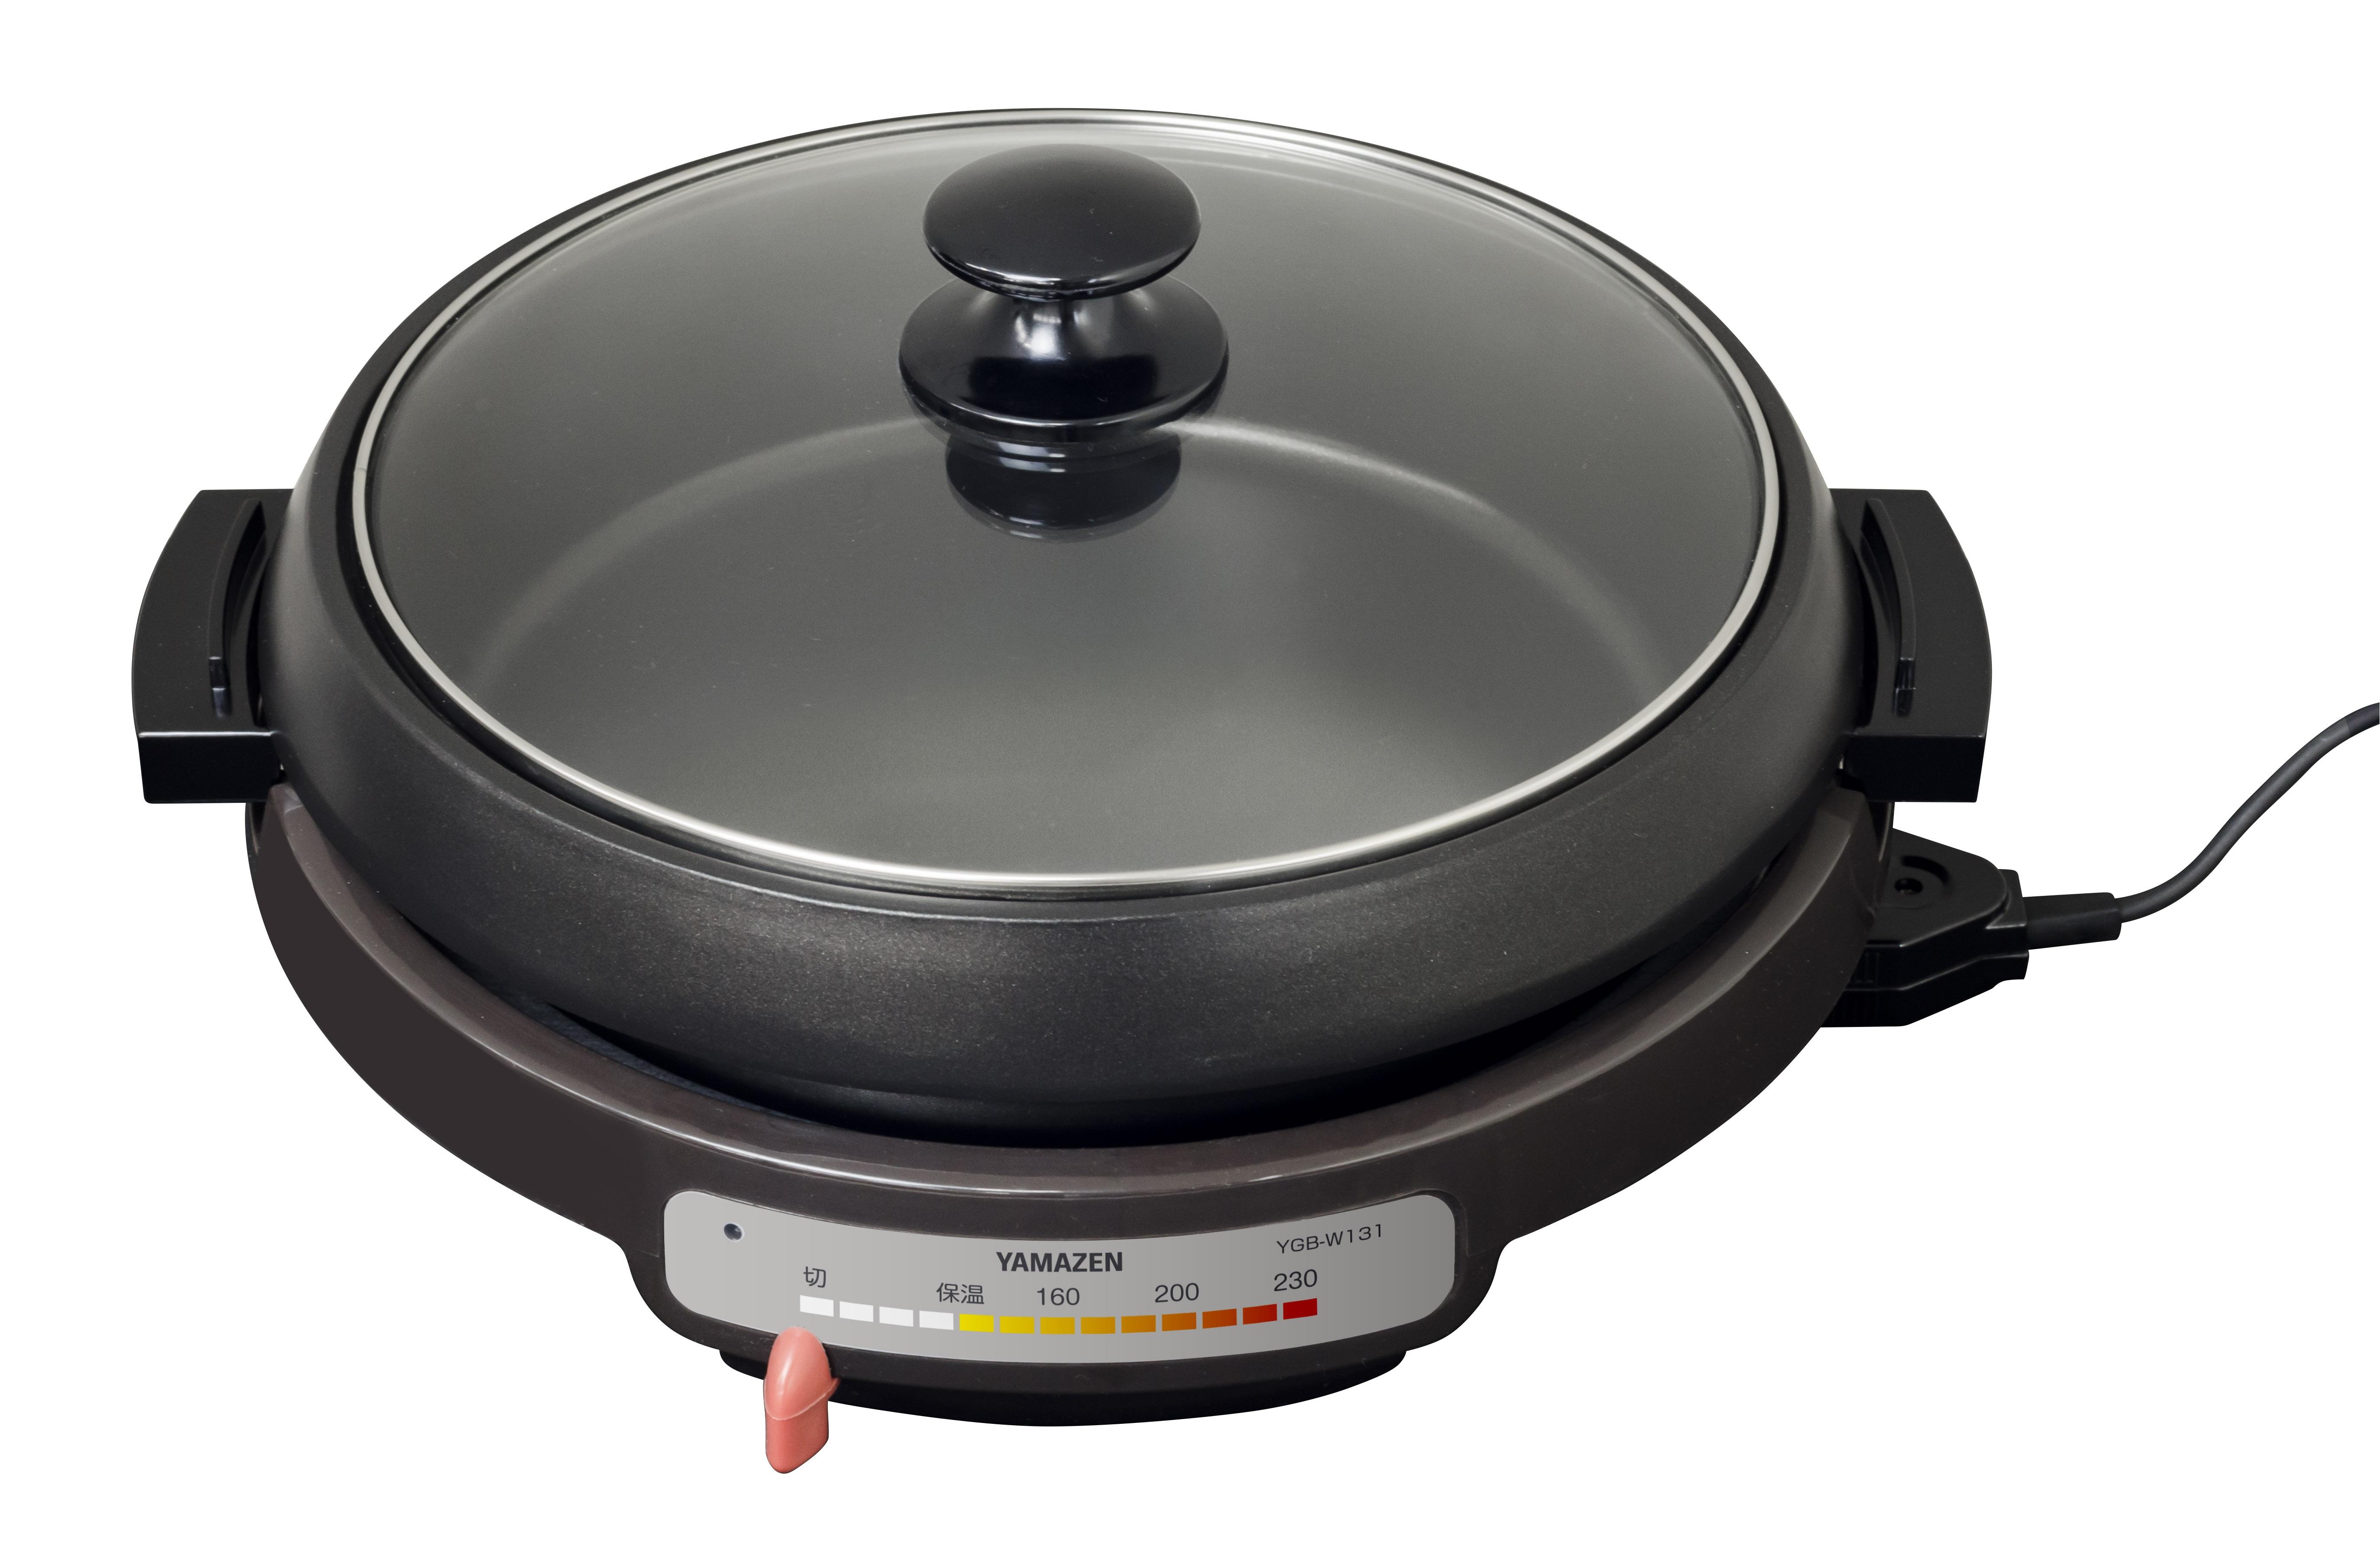 【YAMAZEN】グリル鍋